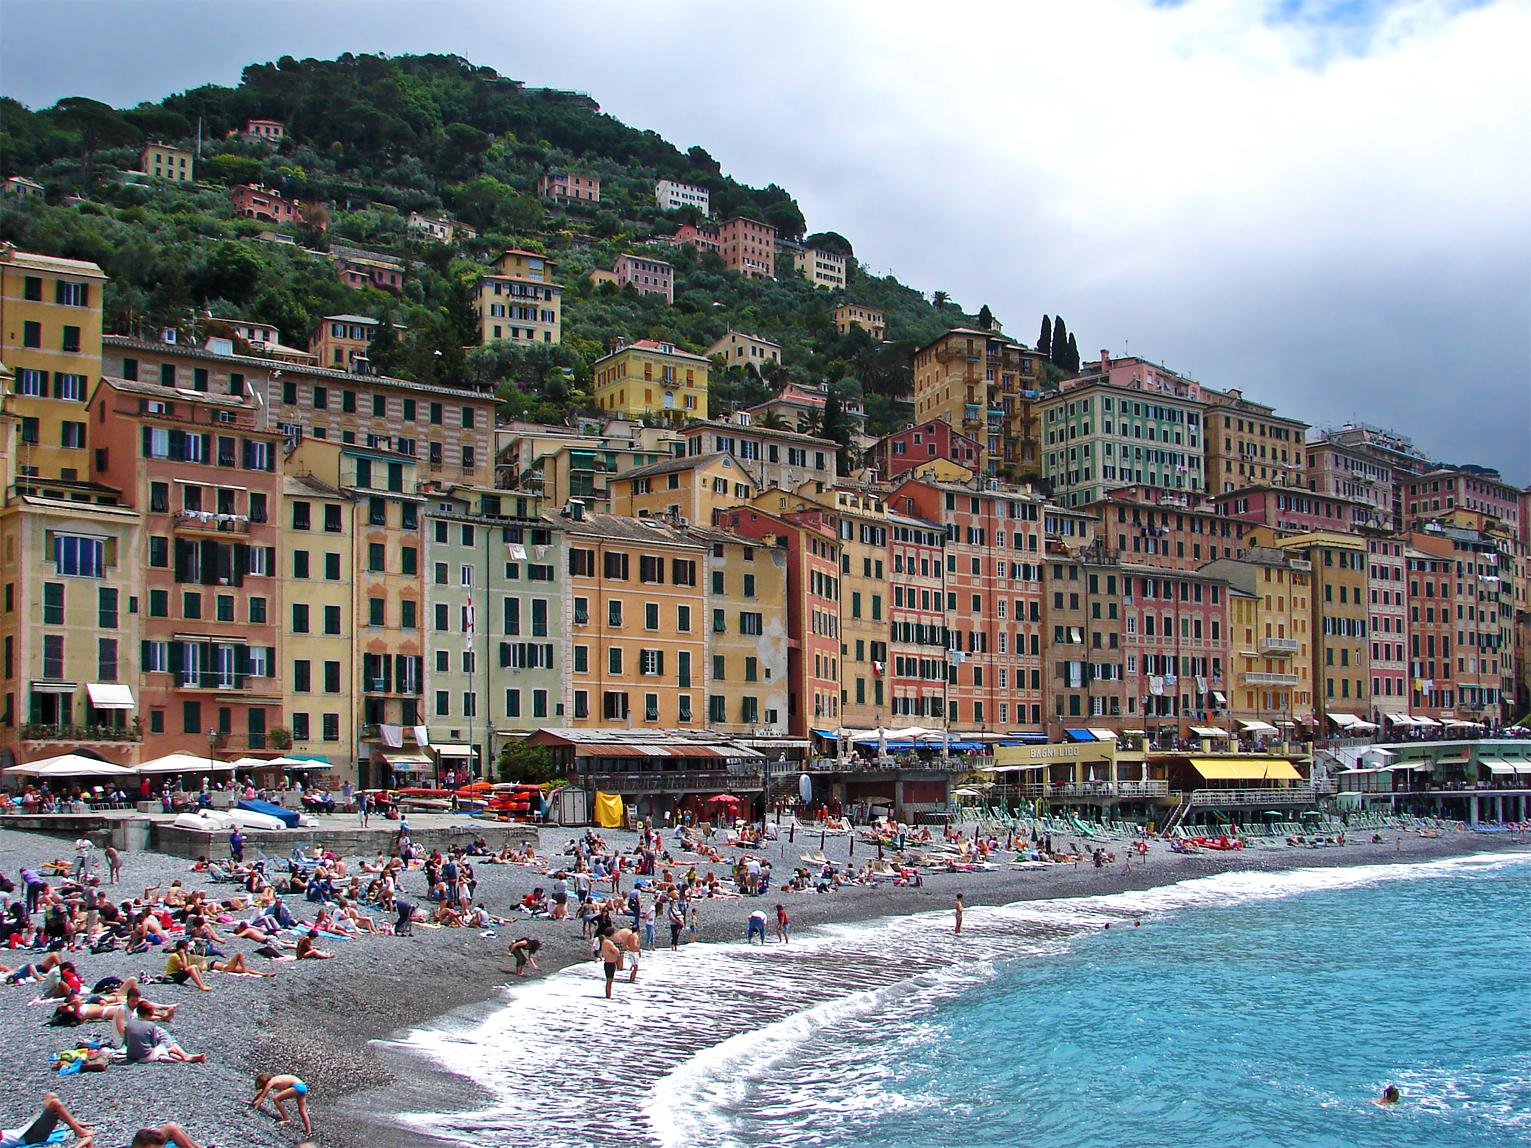 hintergrundbilder meer stadt italien bucht wasser ufer himmel strand tourismus k ste. Black Bedroom Furniture Sets. Home Design Ideas